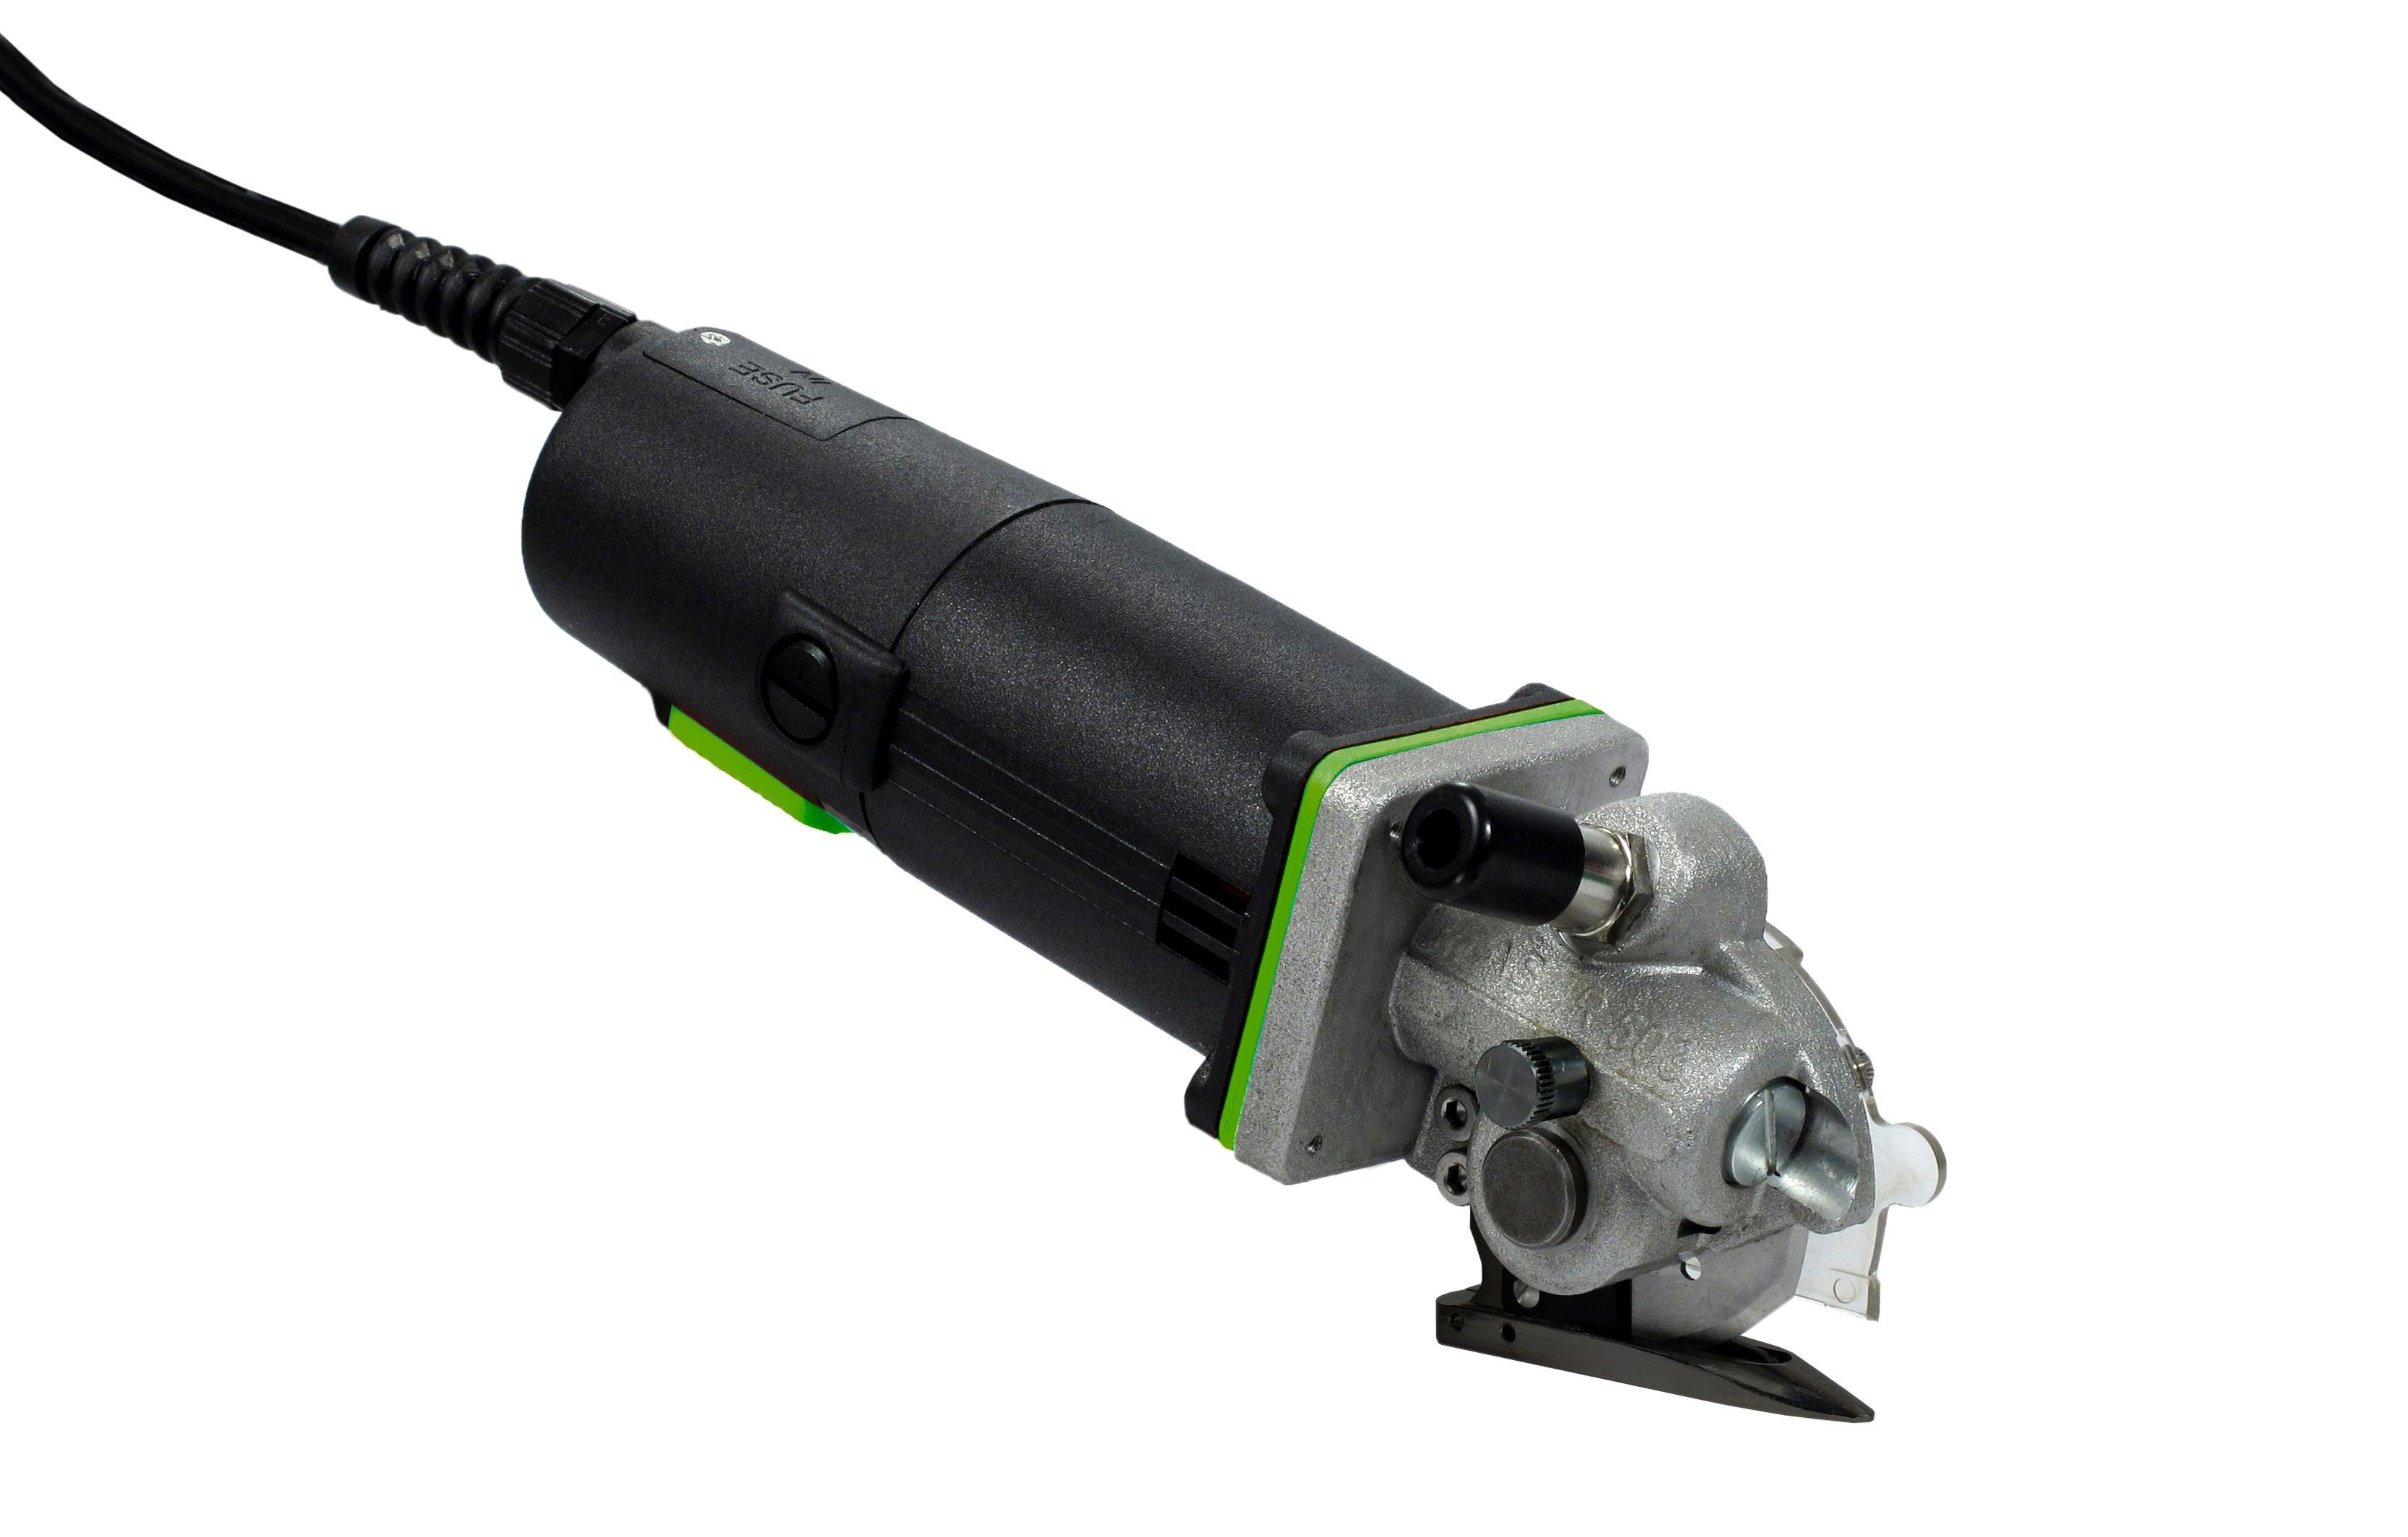 RASOR Elektroschere DS504